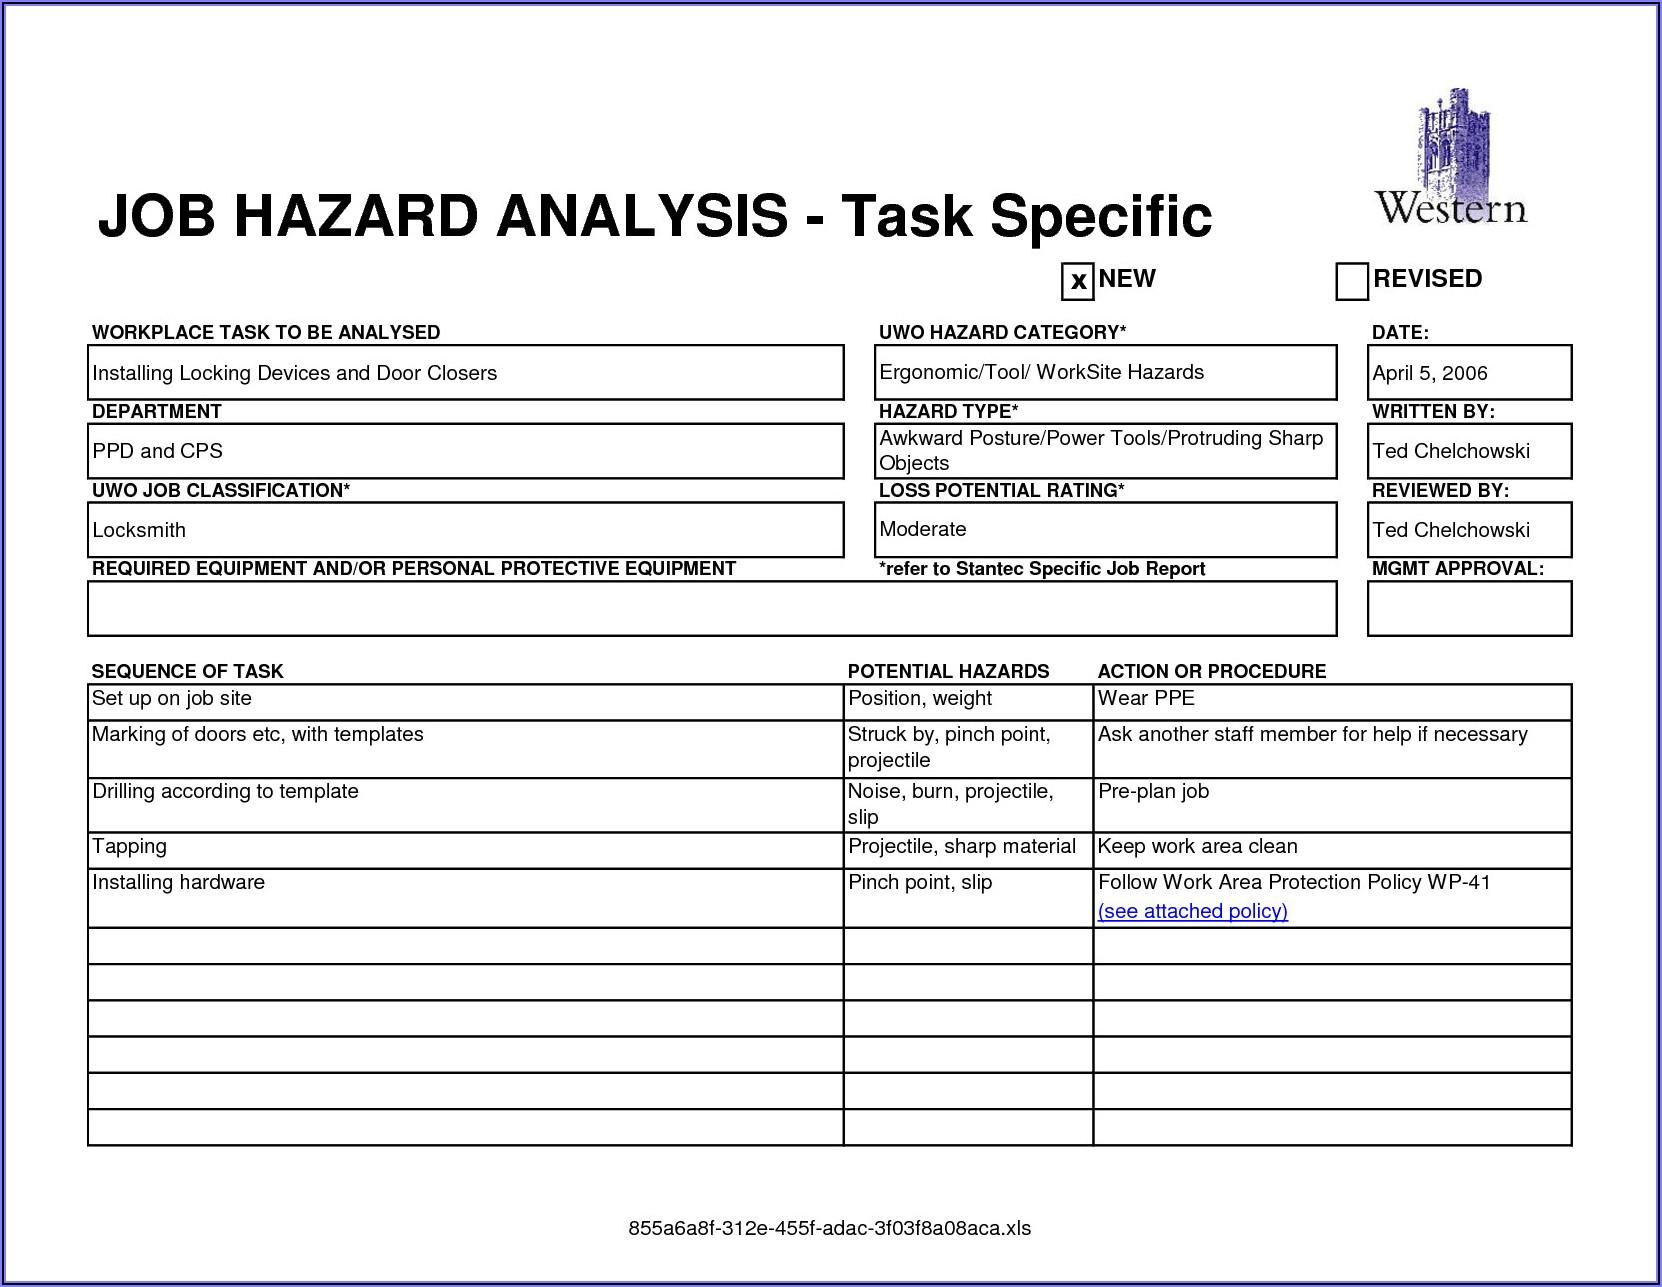 Job Hazard Analysis Template For Construction